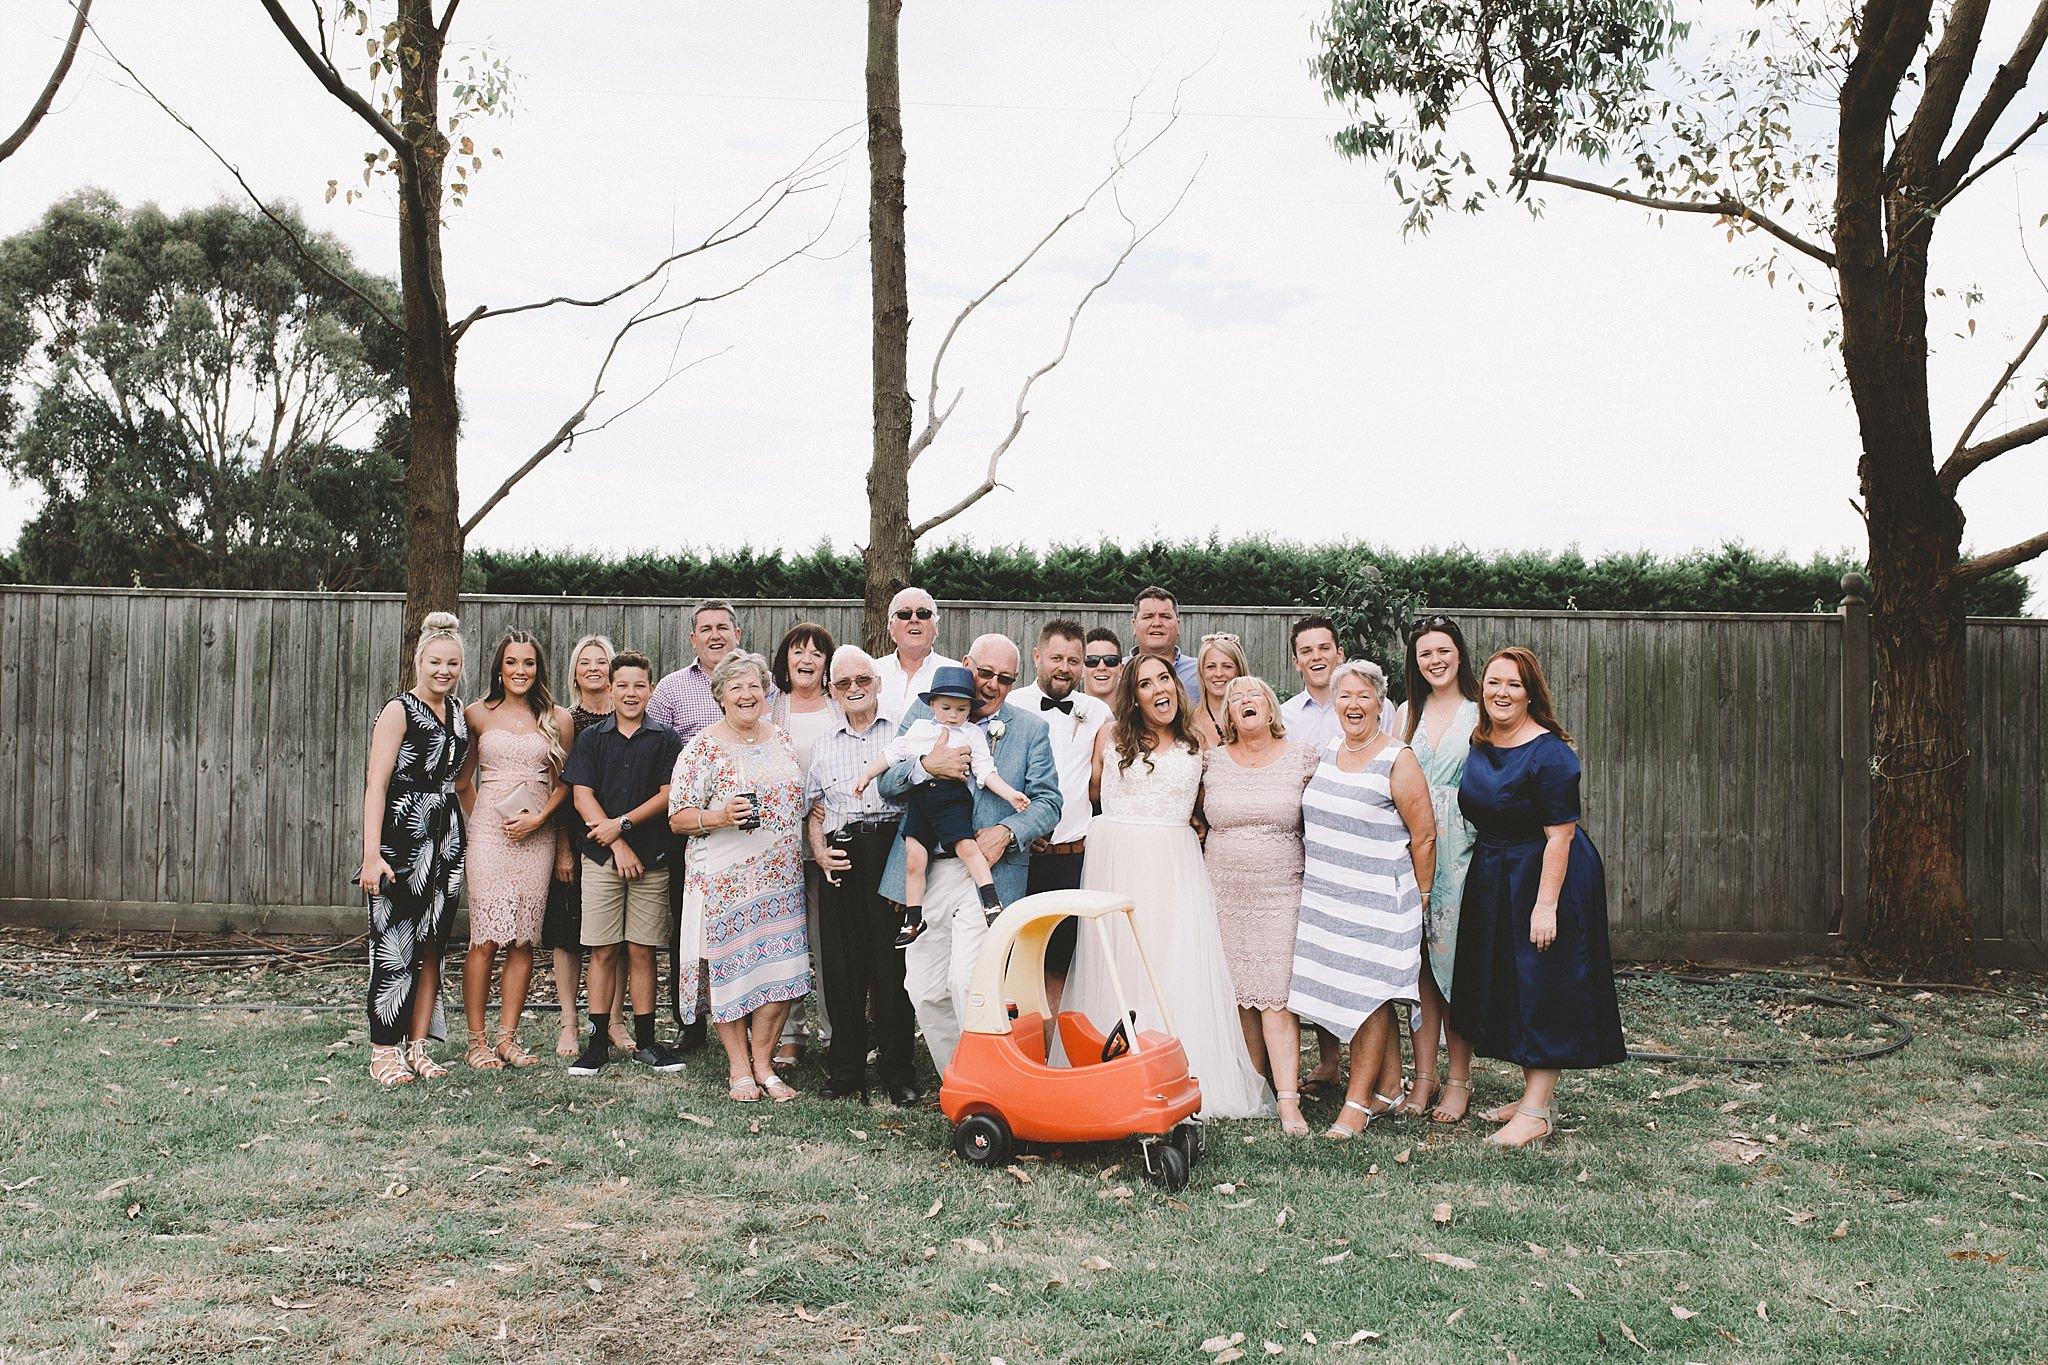 Mornington Peninsula Wedding Photographer 110.JPG